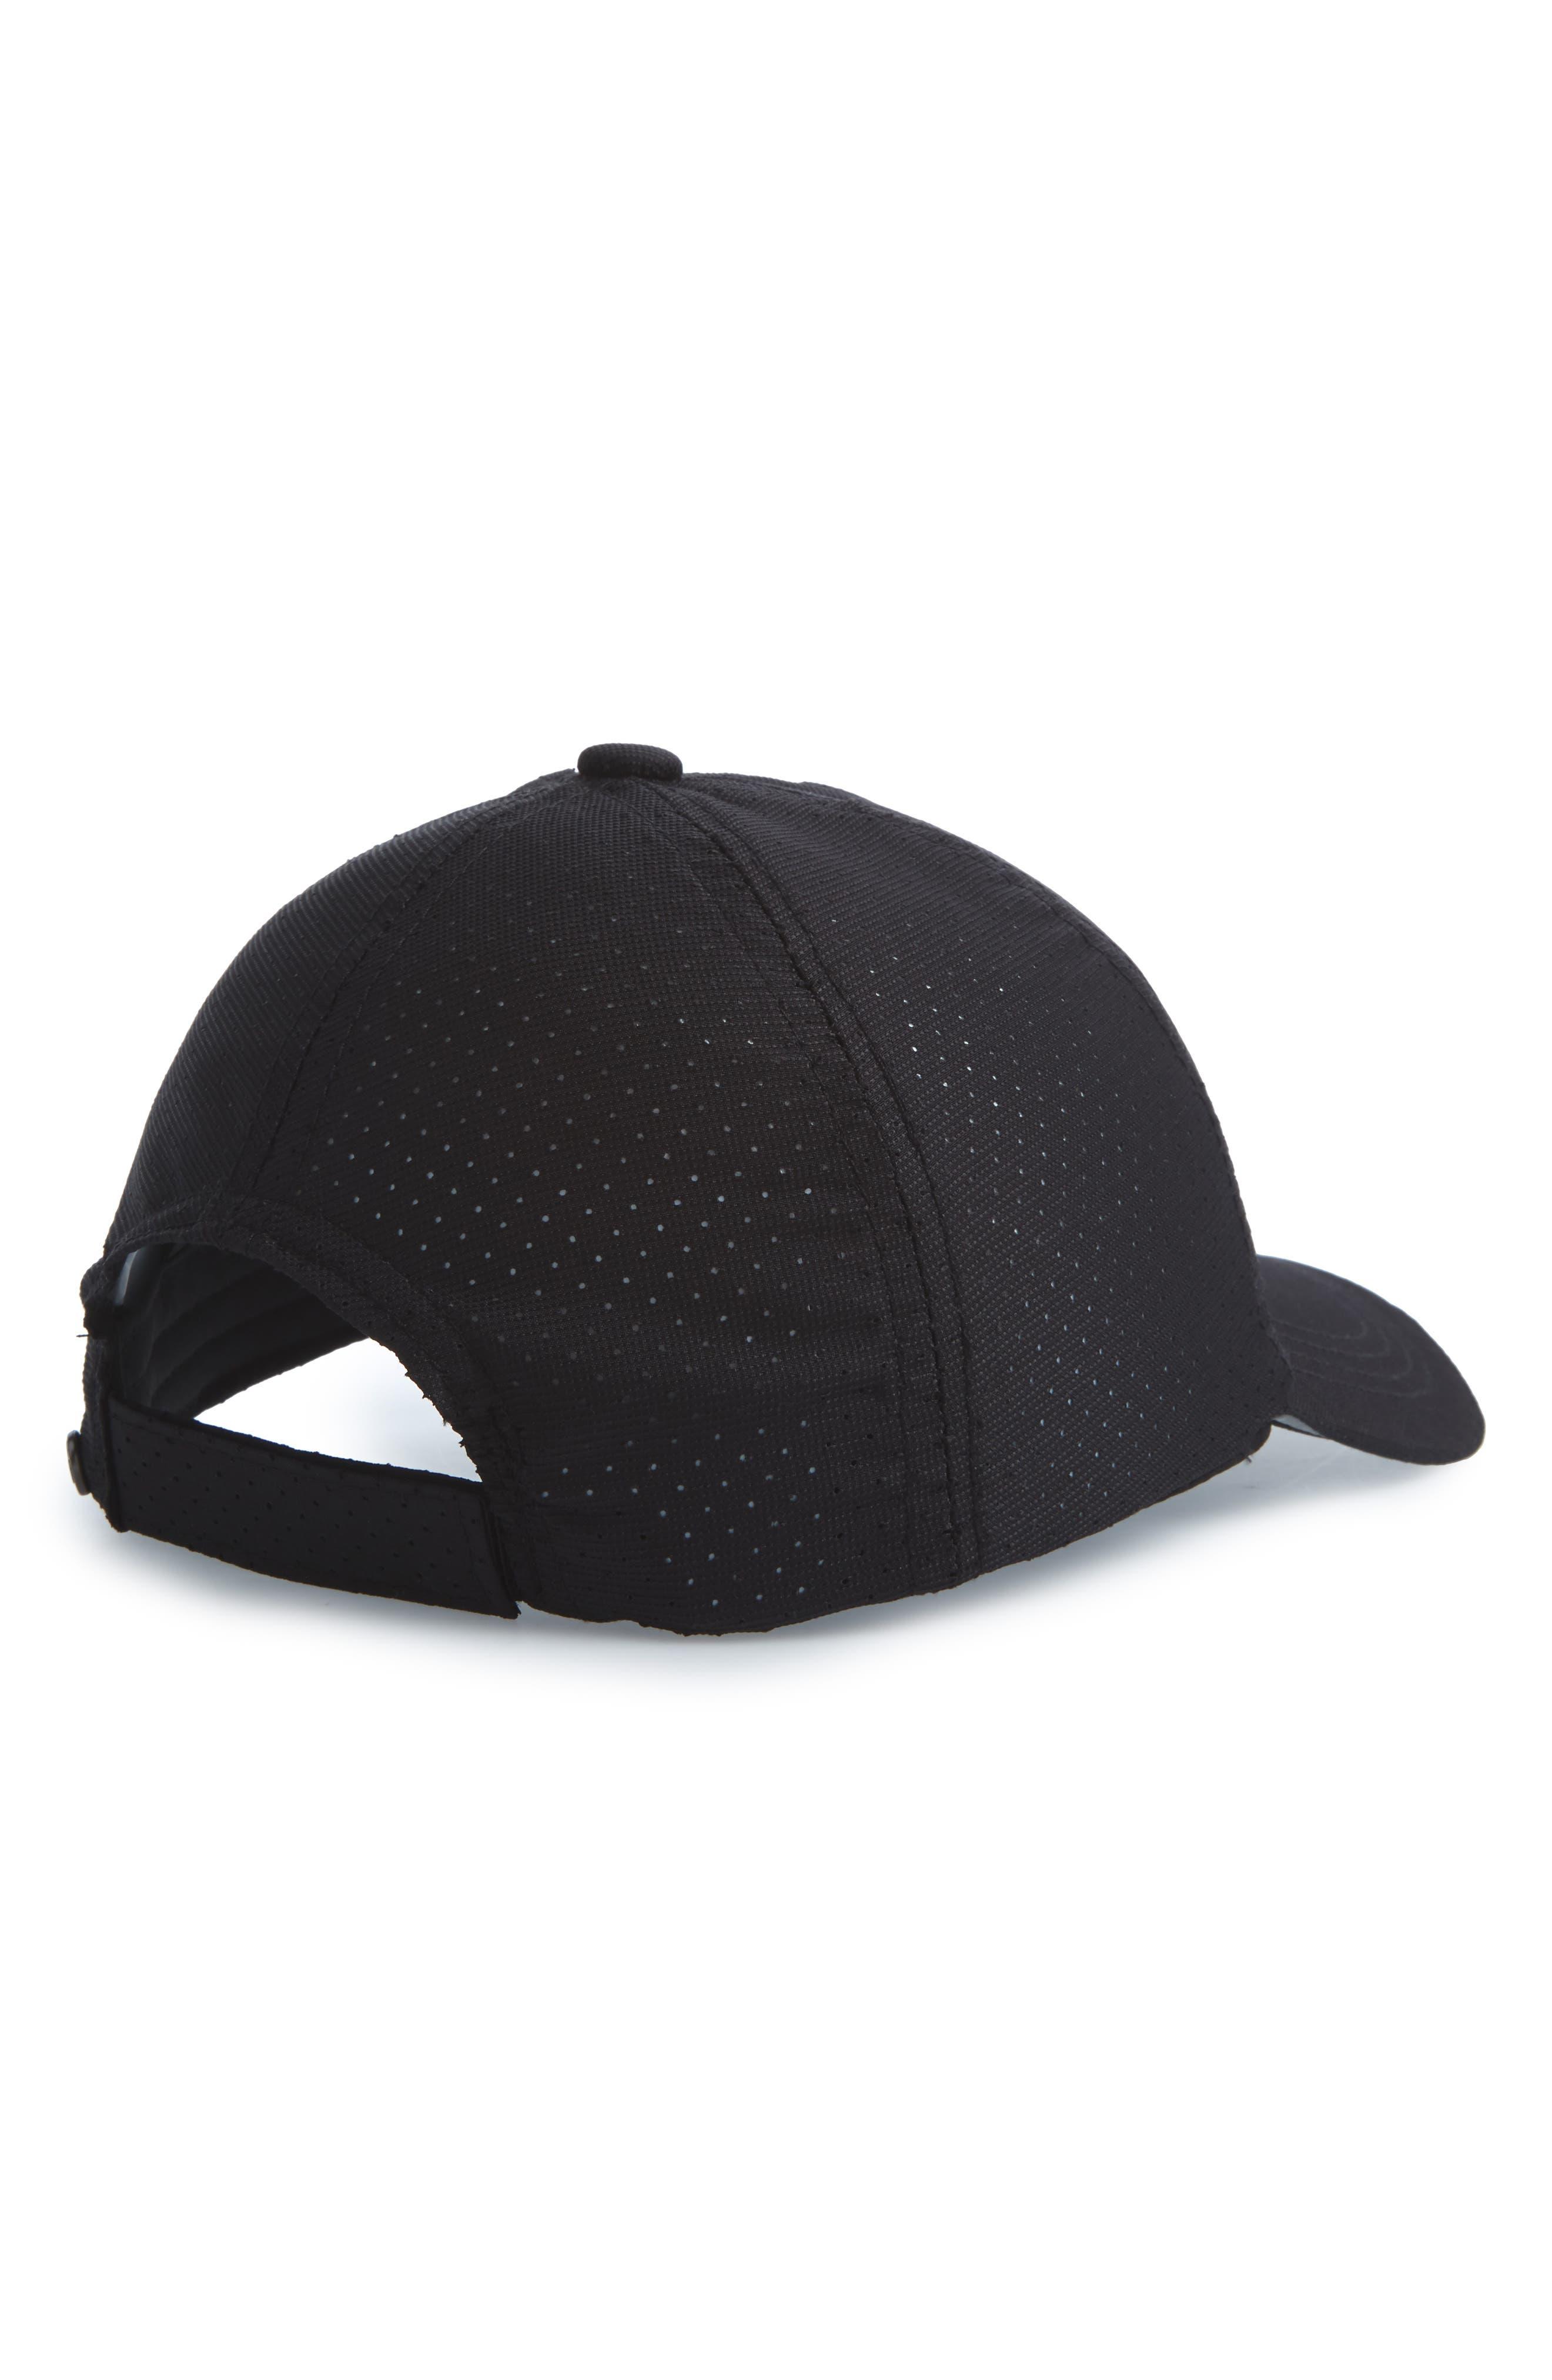 Perforated Run Hat,                             Alternate thumbnail 2, color,                             001